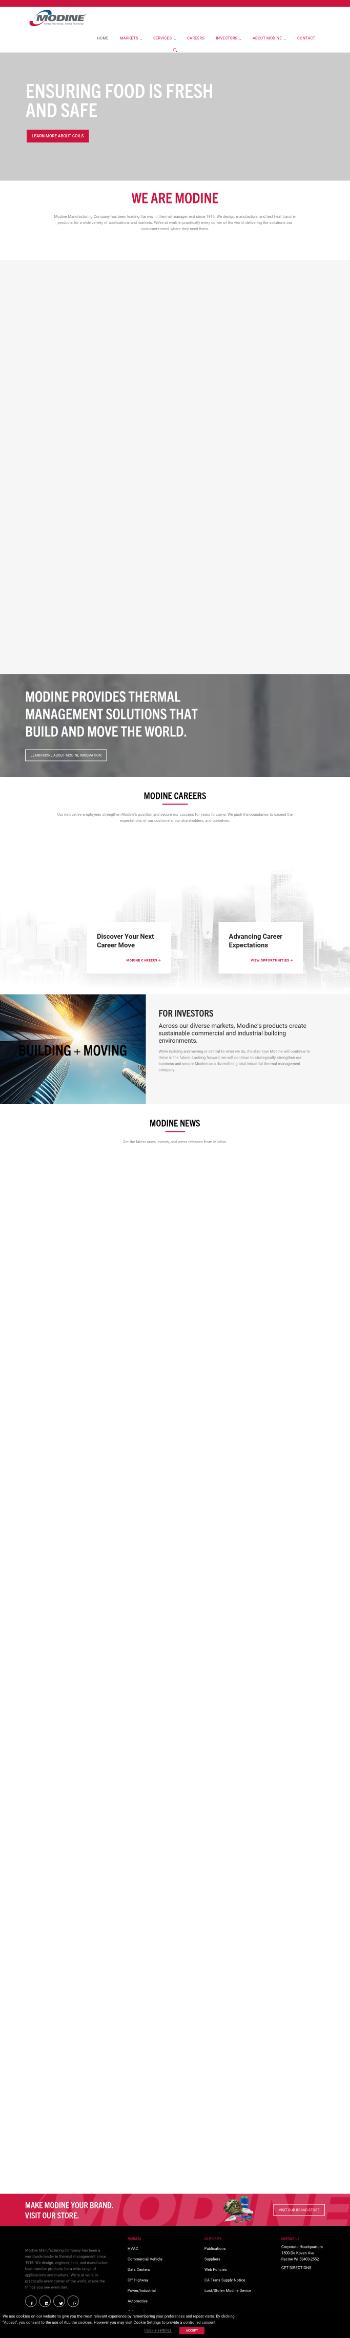 Modine Manufacturing Company Website Screenshot